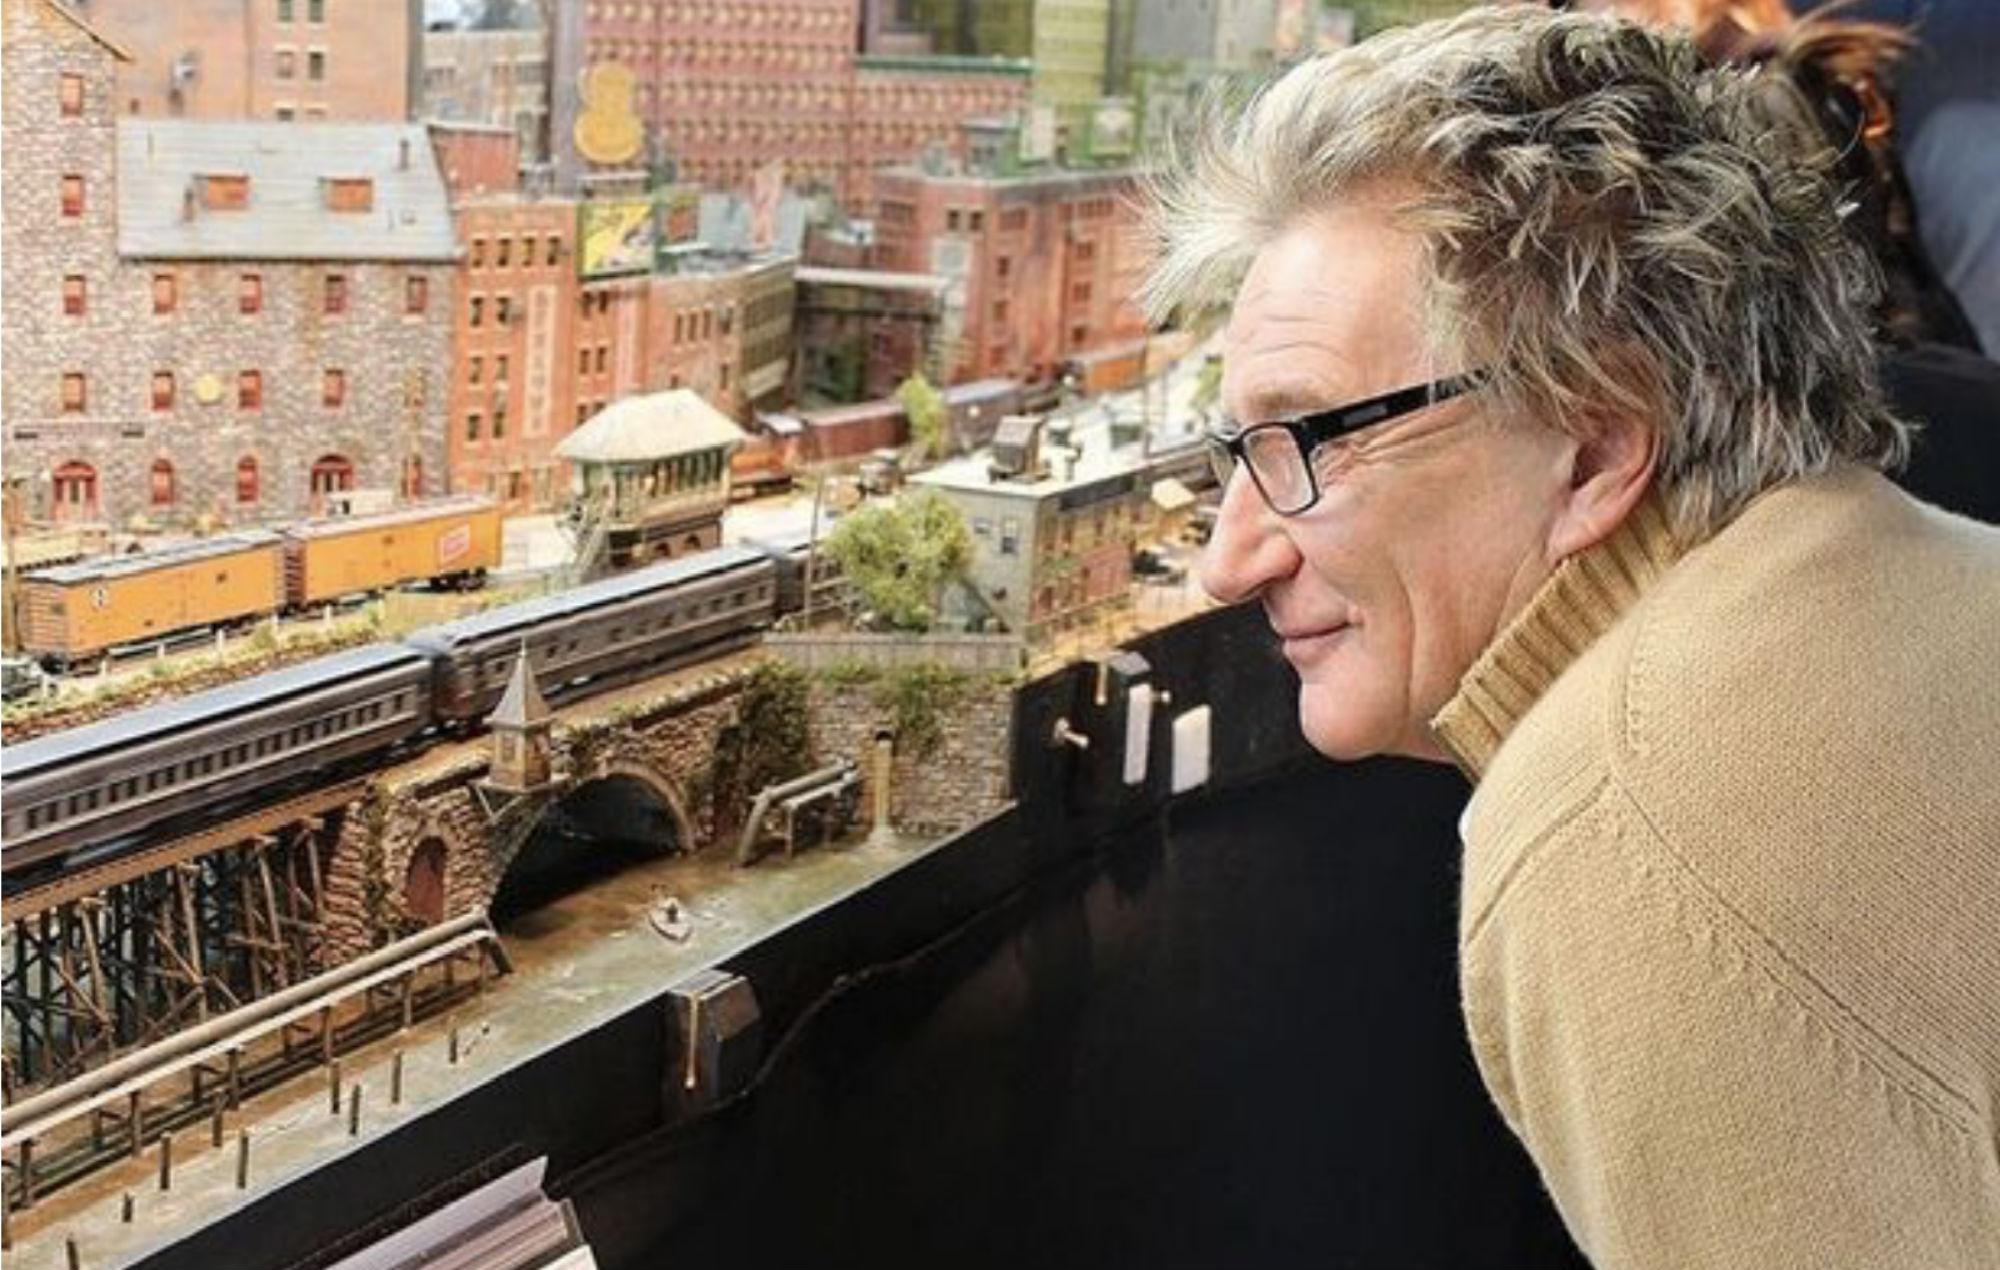 We are railing: Rod Stewart reveals he's spent 26 years making a huge model railway